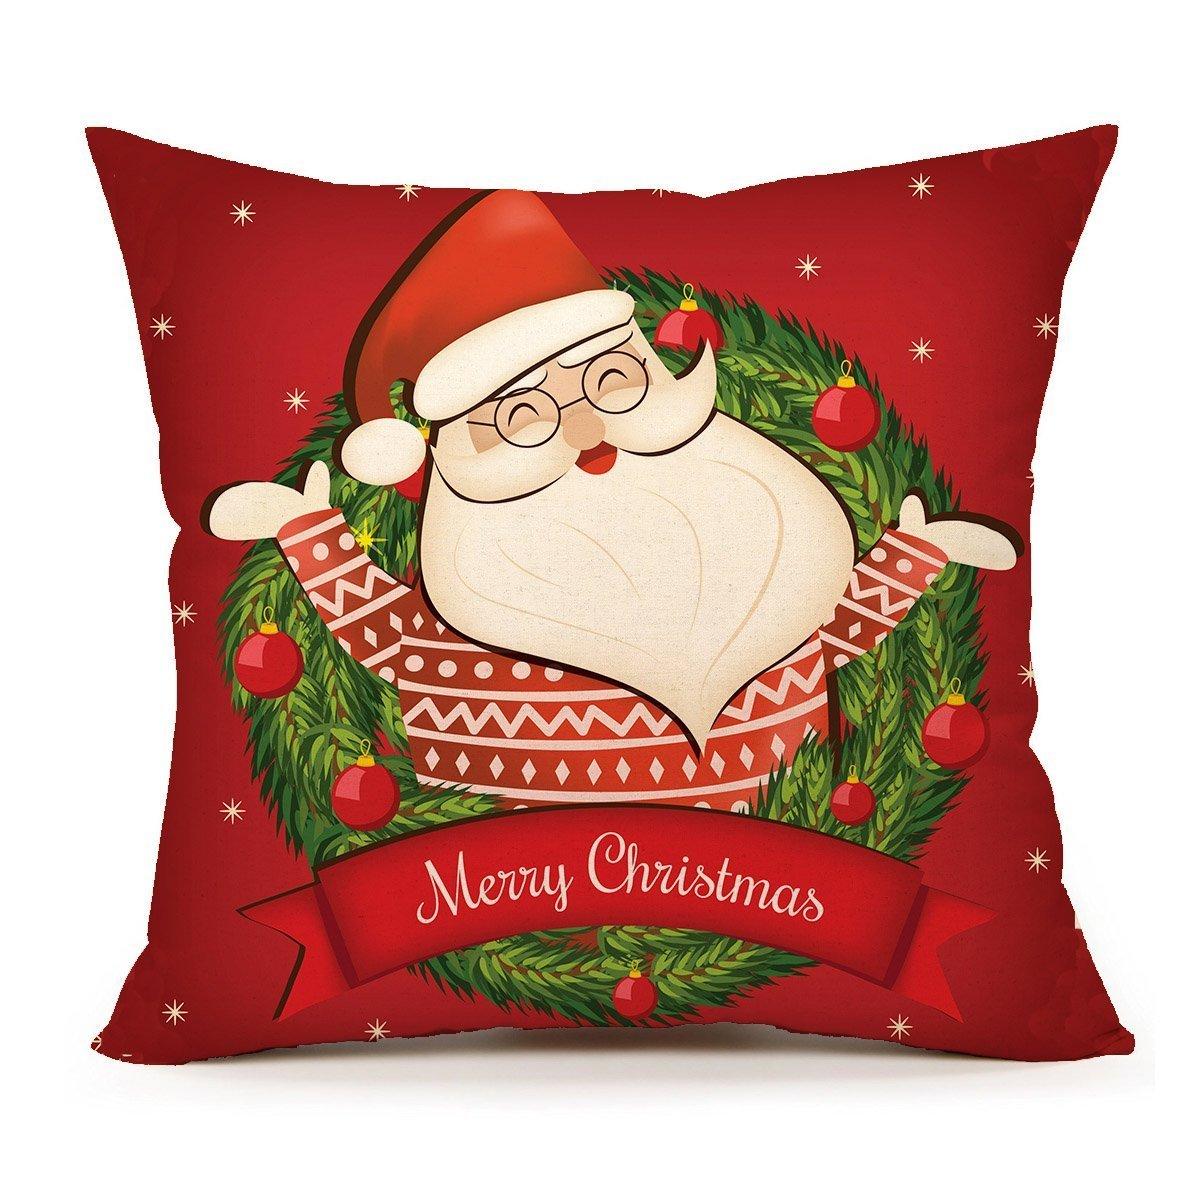 spxubzレッドサンタクロースクリスマス( Smile )枕カバー装飾ホーム装飾素敵なギフトスクエアインドア/アウトドア枕カバーサイズ: 18 x 18インチ(両面) 20x20 Inch B07CGN99SN